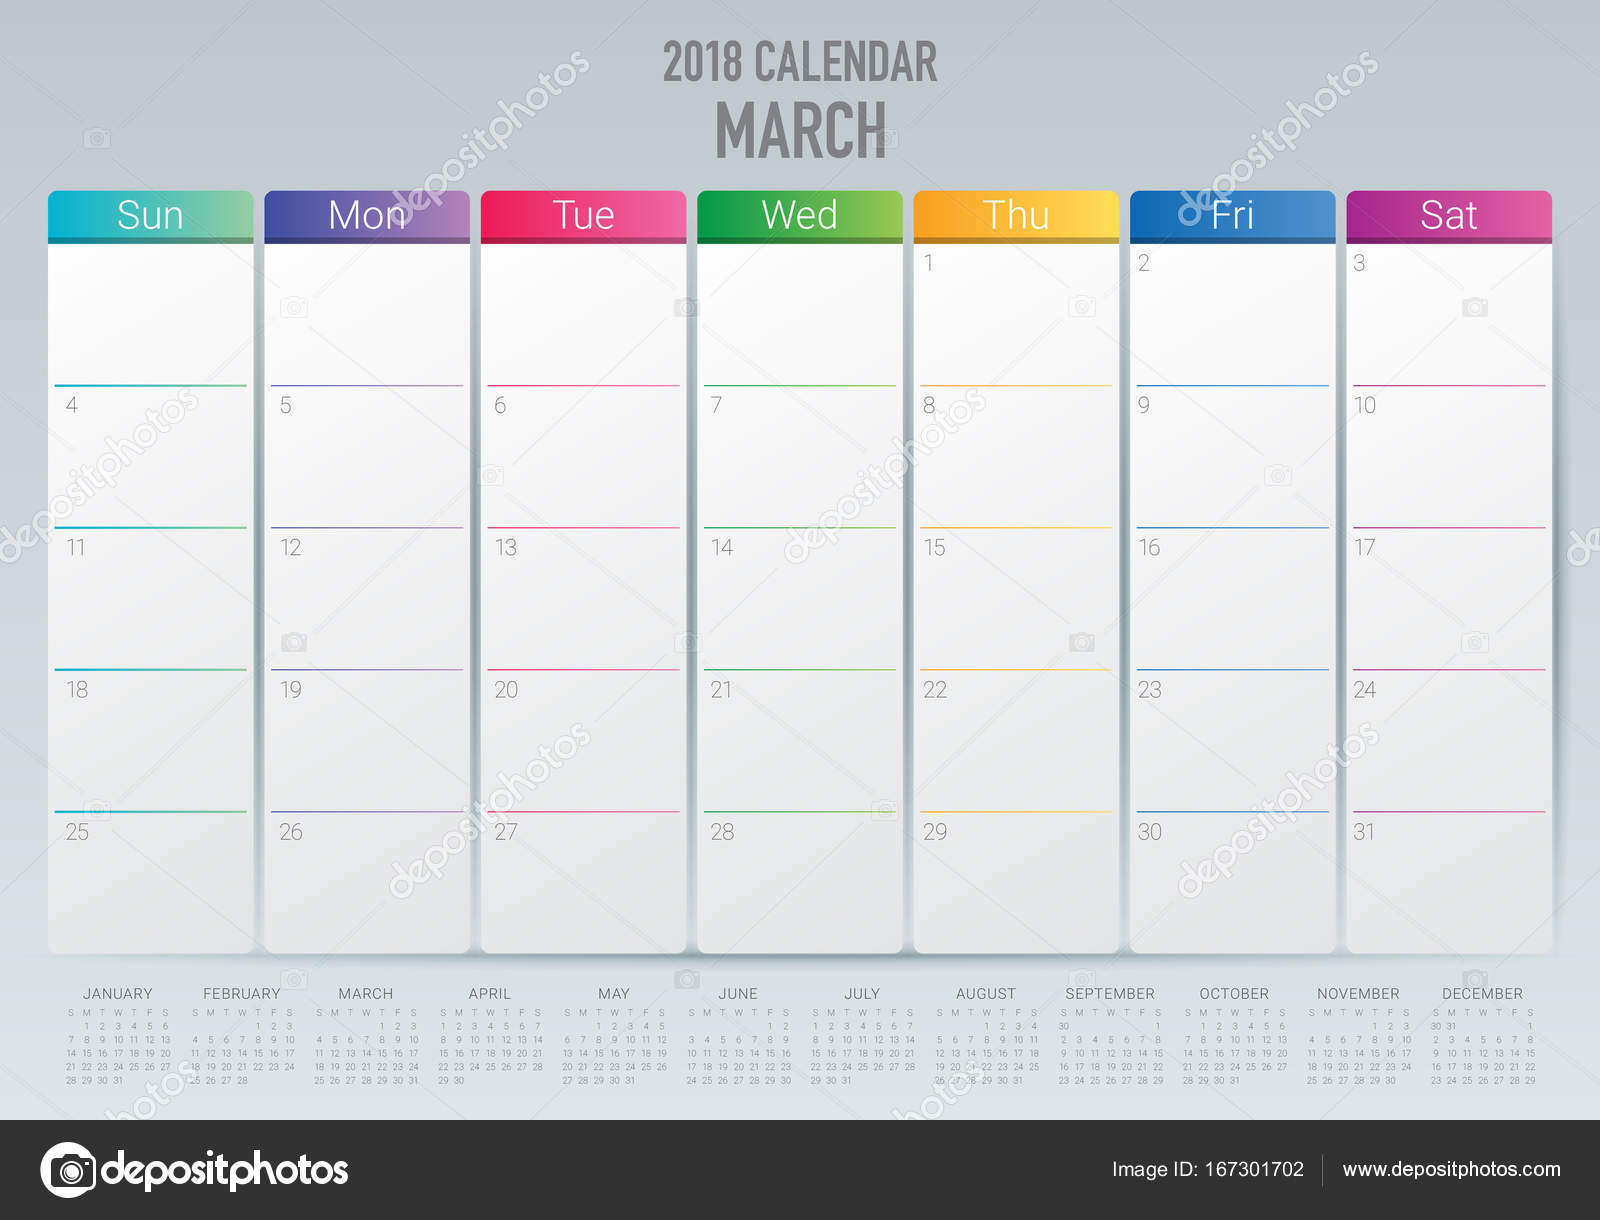 March 2018 Calendar Planner Vector Illustration Stock